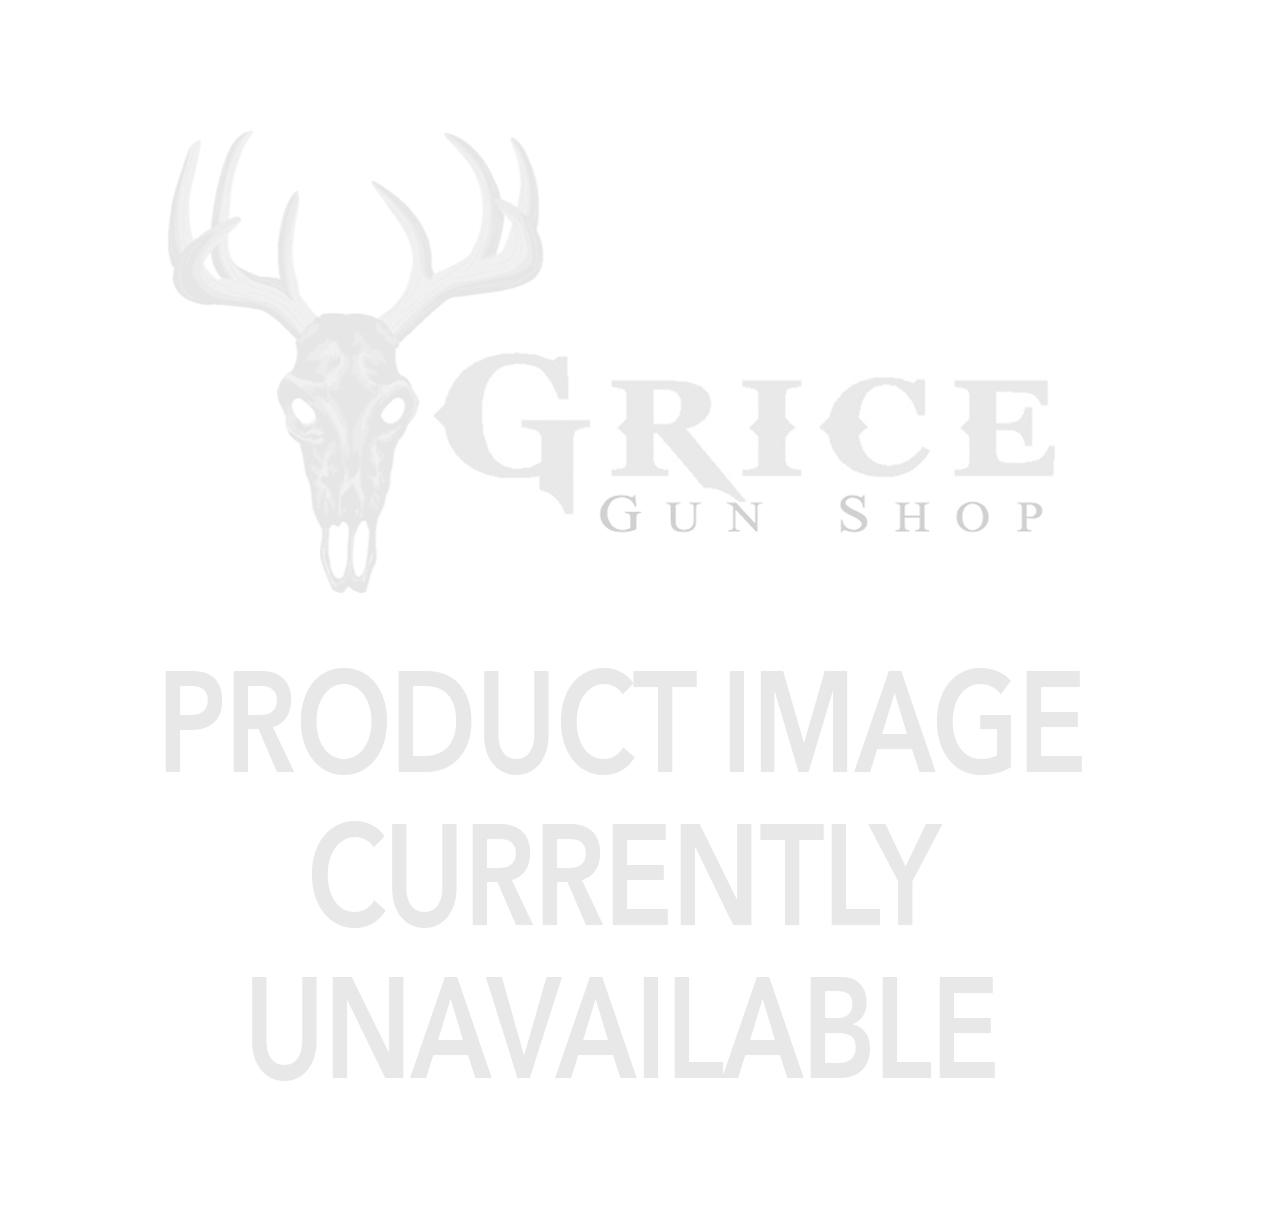 "Thompson Center - Pro Hunter 15"" Stainless Fluted Barrel 30-06Spfd"